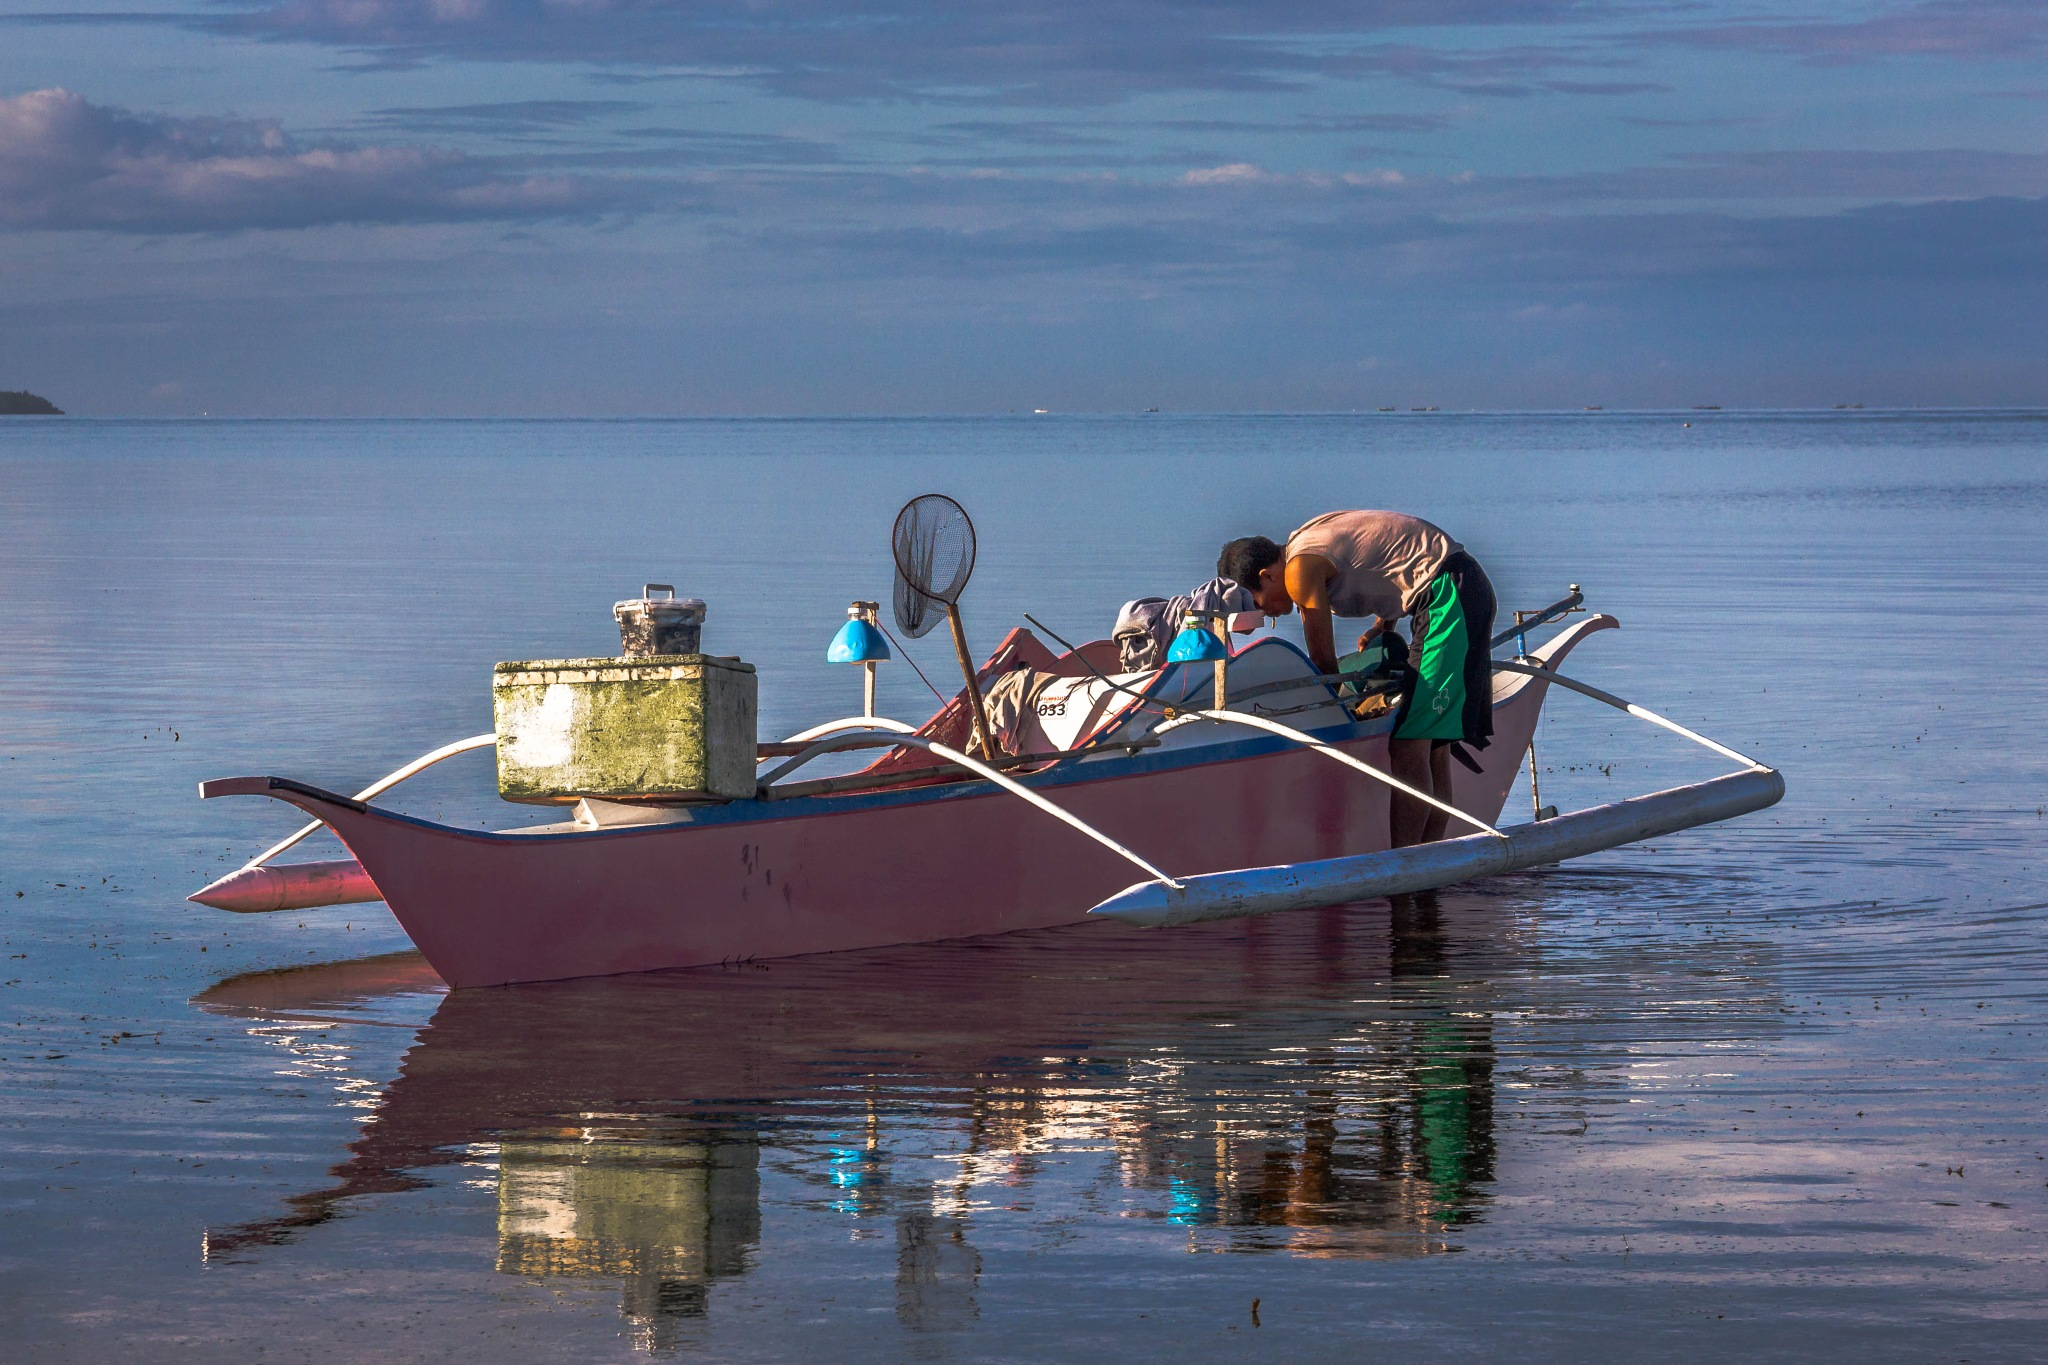 fisherman by owen s. duazo